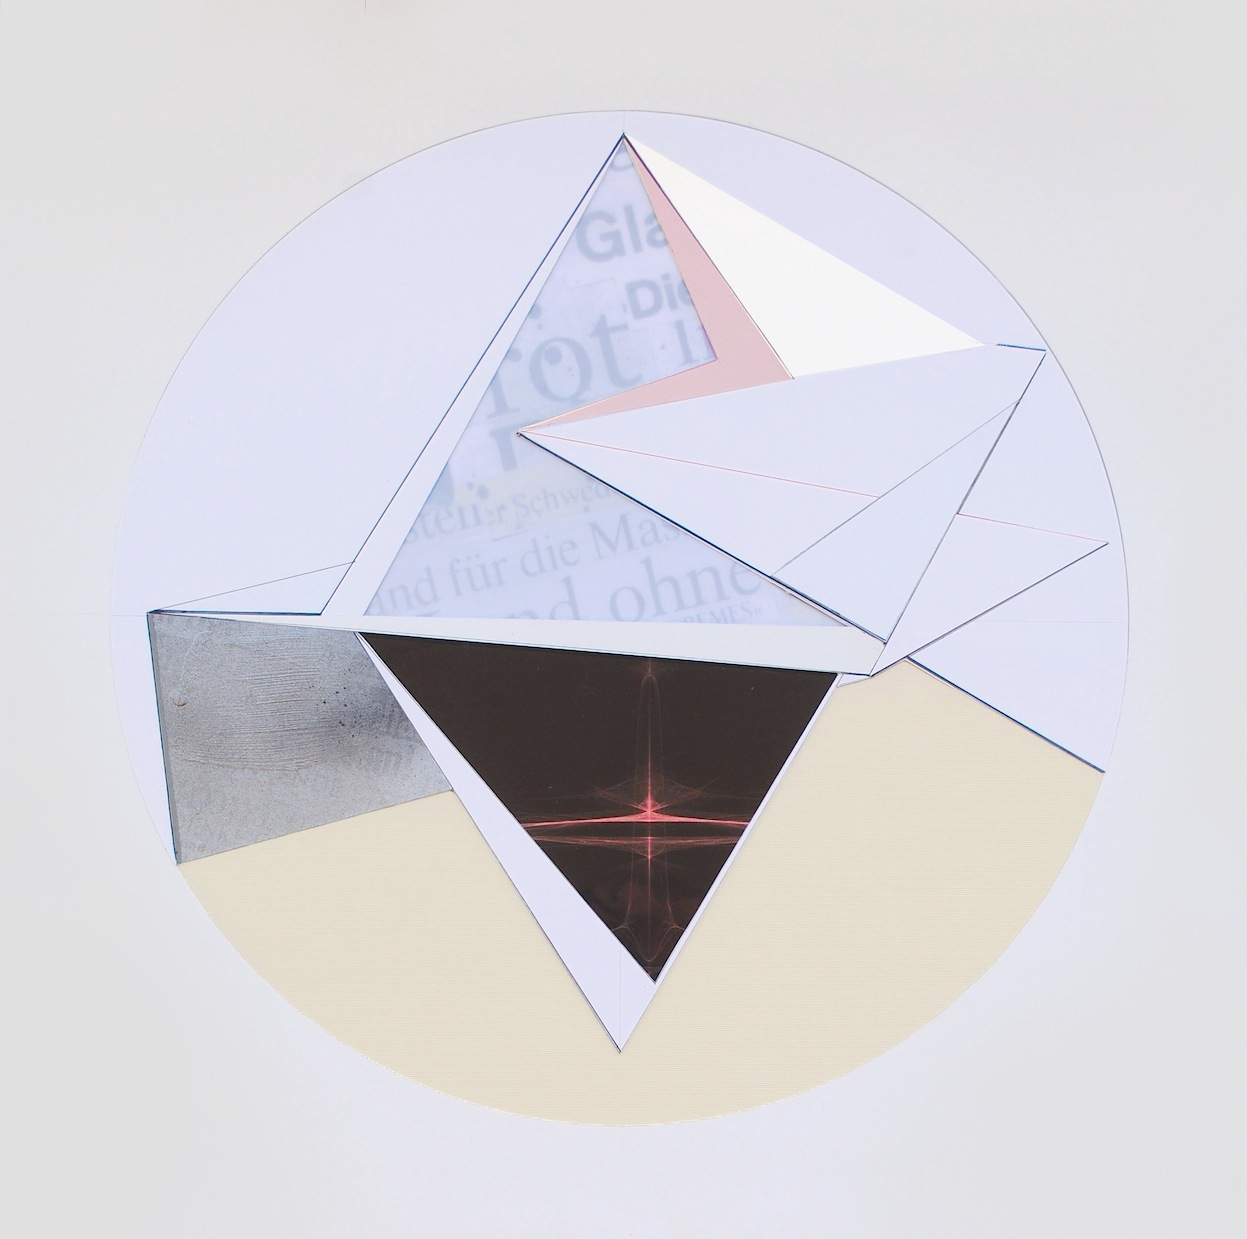 Isabelle Borges, Circle 20, COLAGEM , PAPEL SINTETICO, IMPRESSAO DIGITAL, CANETA EDDING, 50 x 50 cm, 2016